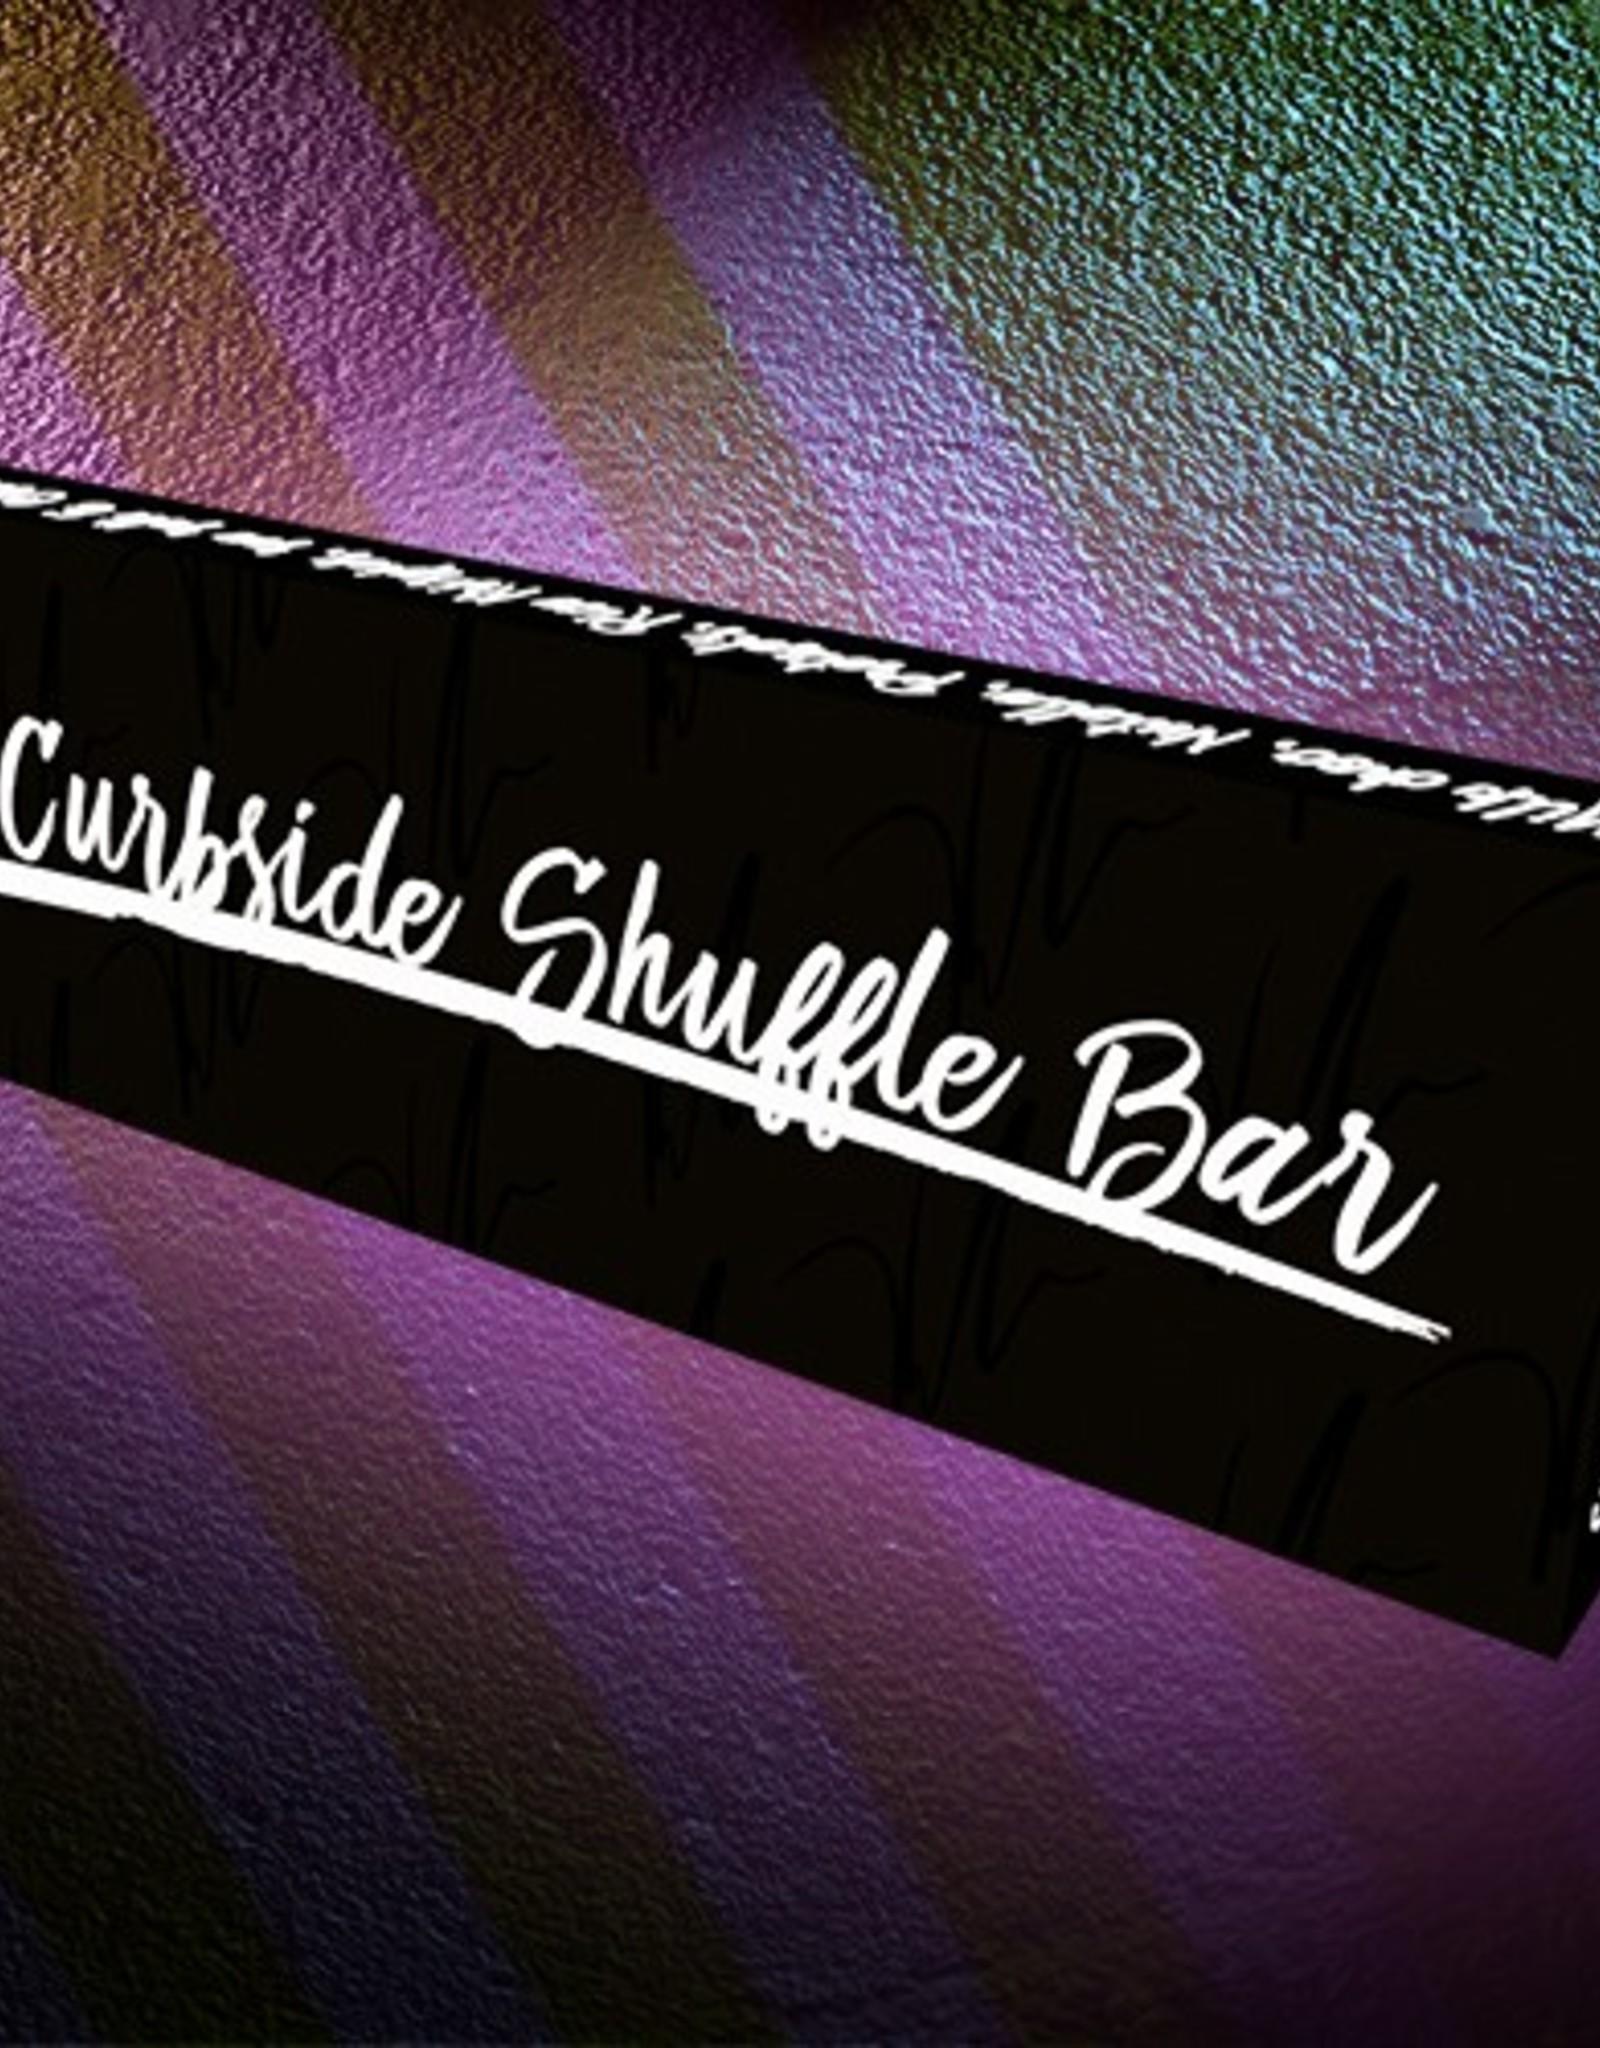 Keynon McBurney's Curbside Shuffle Chocolate Bar